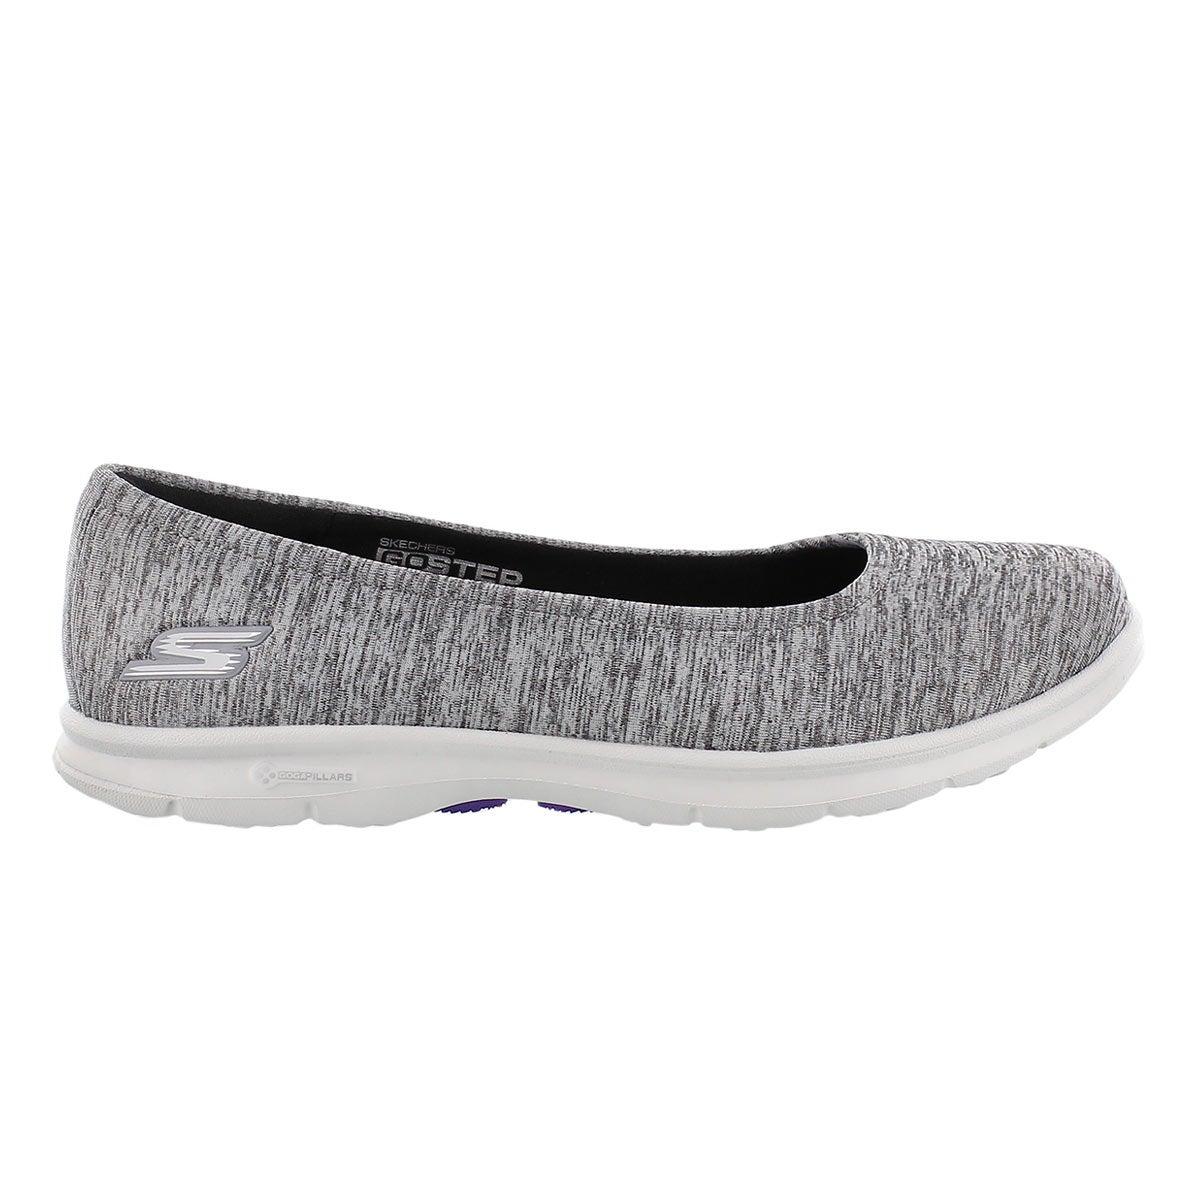 Lds GOstep Challenge blk/wt walking shoe